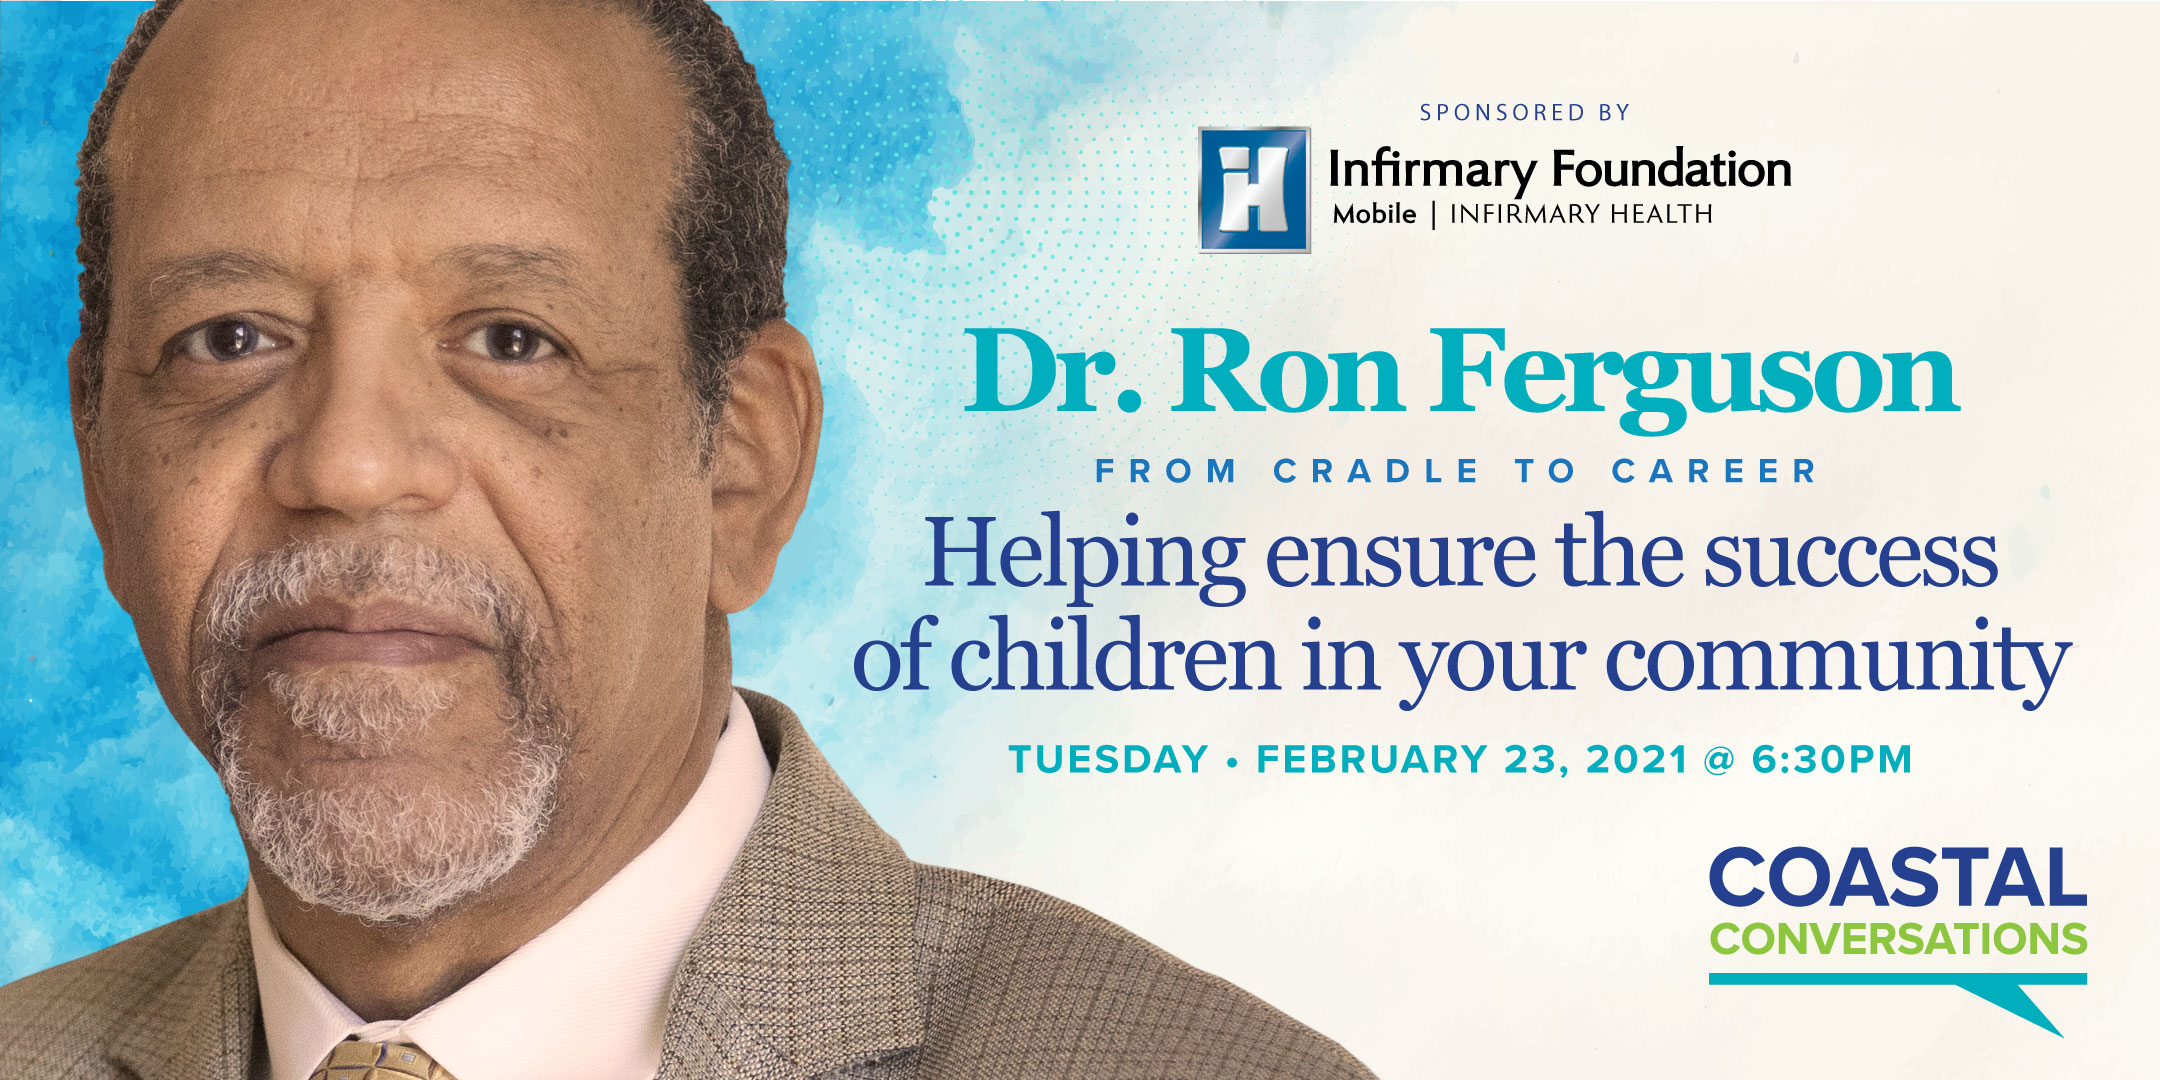 Coastal Conversations featuring Dr. Ron Ferguson